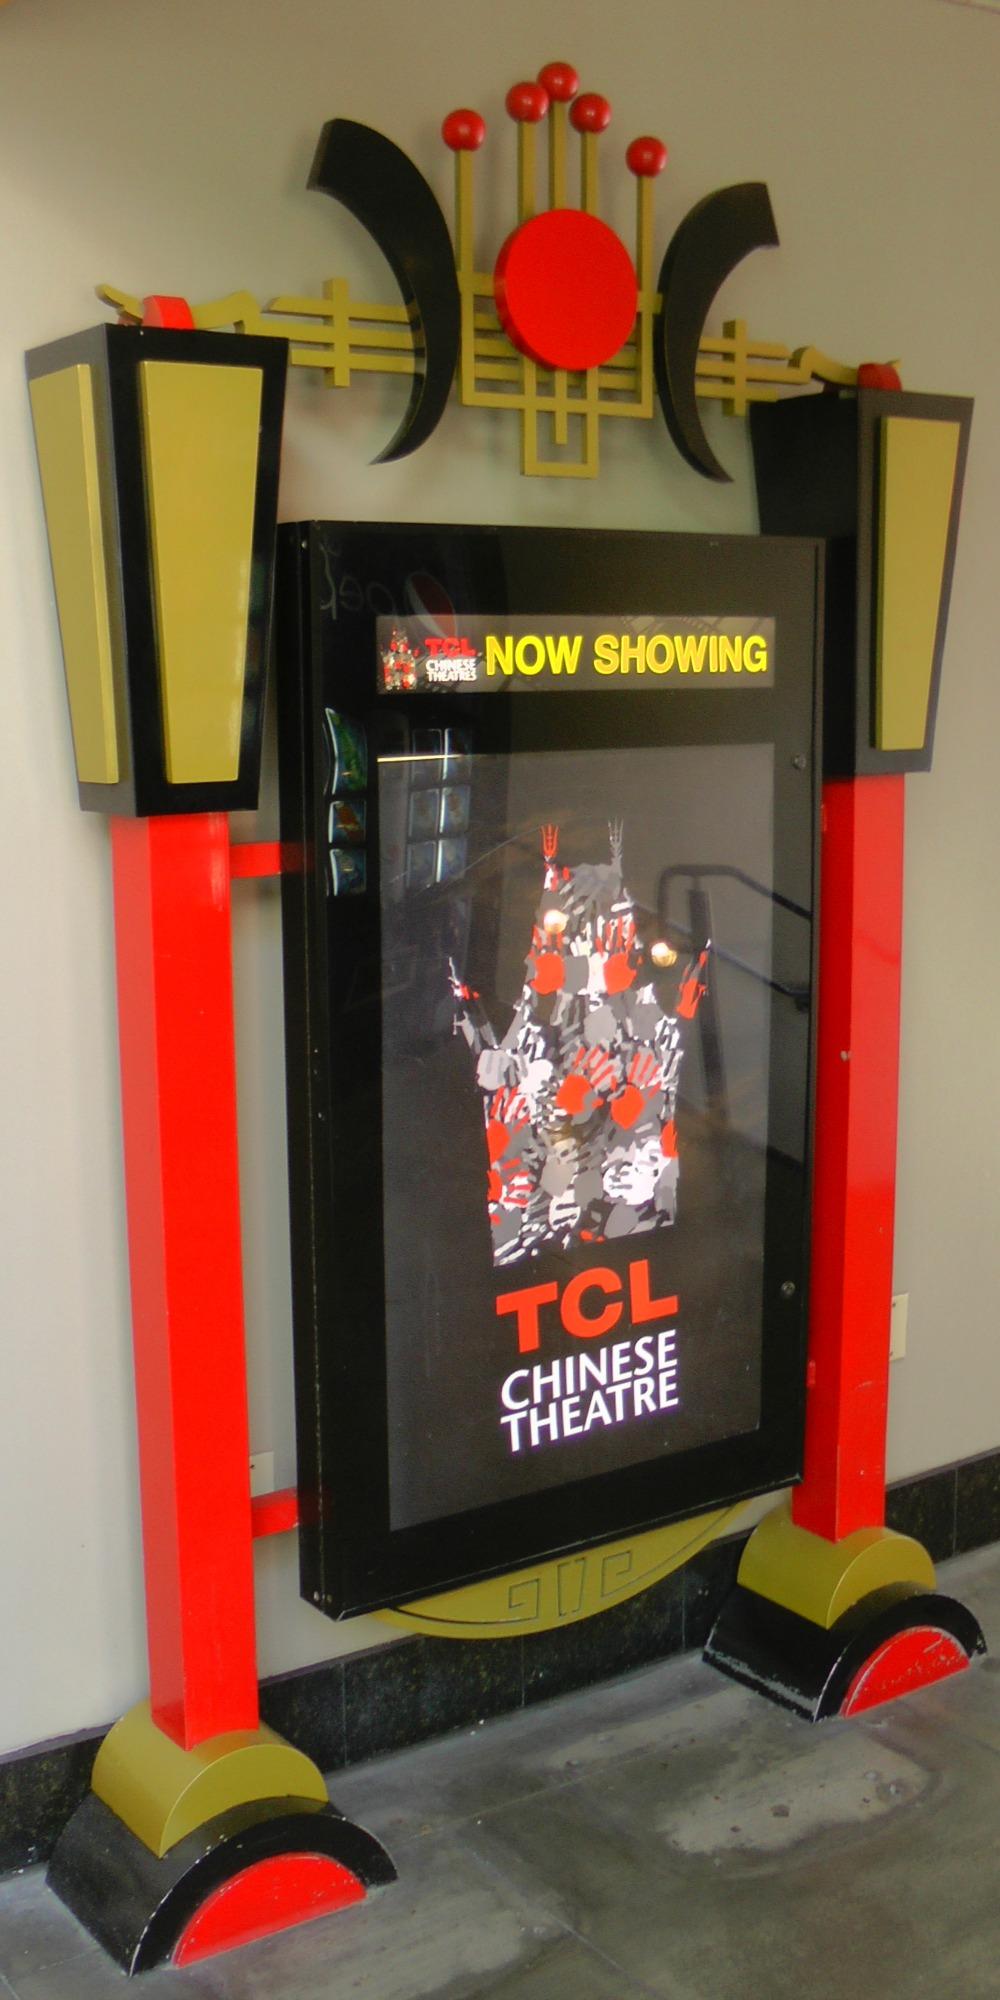 TCLchineseSignOutdoors